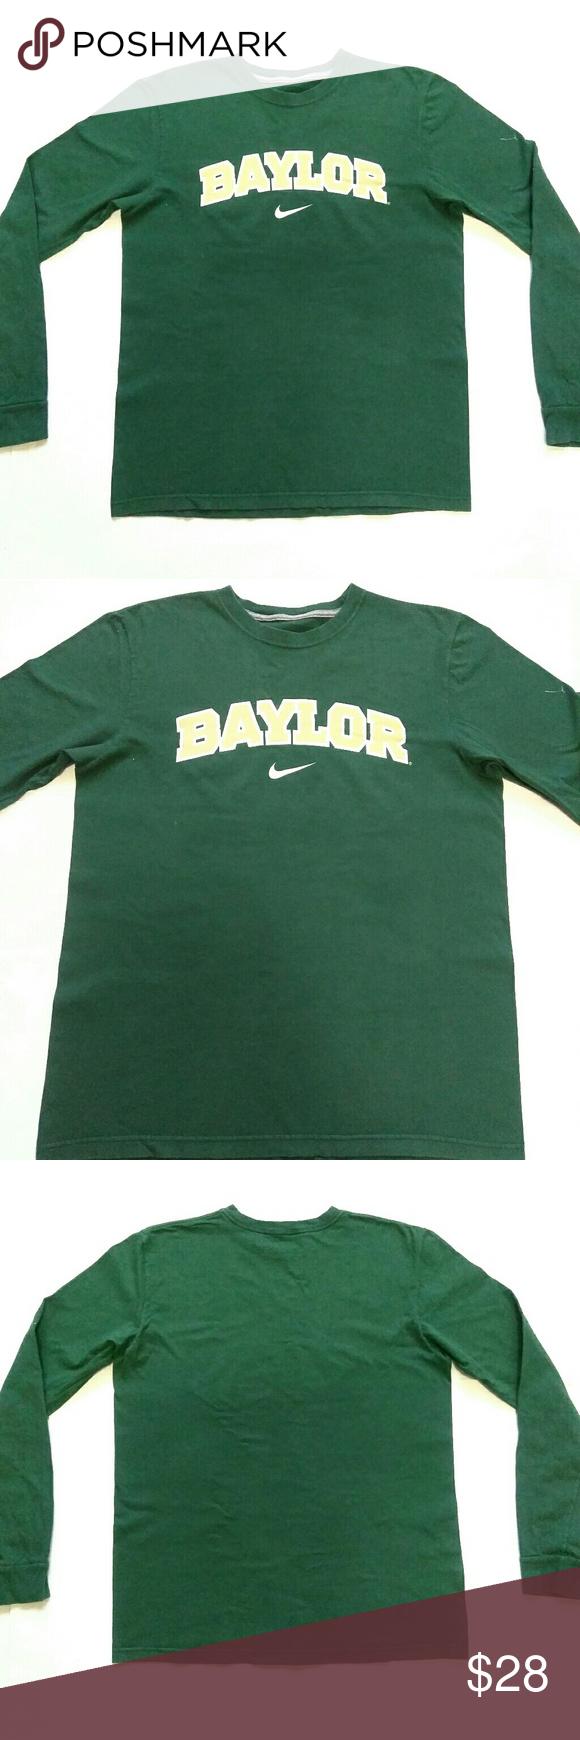 quality design 6208c 9ca1b Nike Baylor Bears Long Sleeve T Shirt Mens Medium You are buying  Nike  Baylor Bears